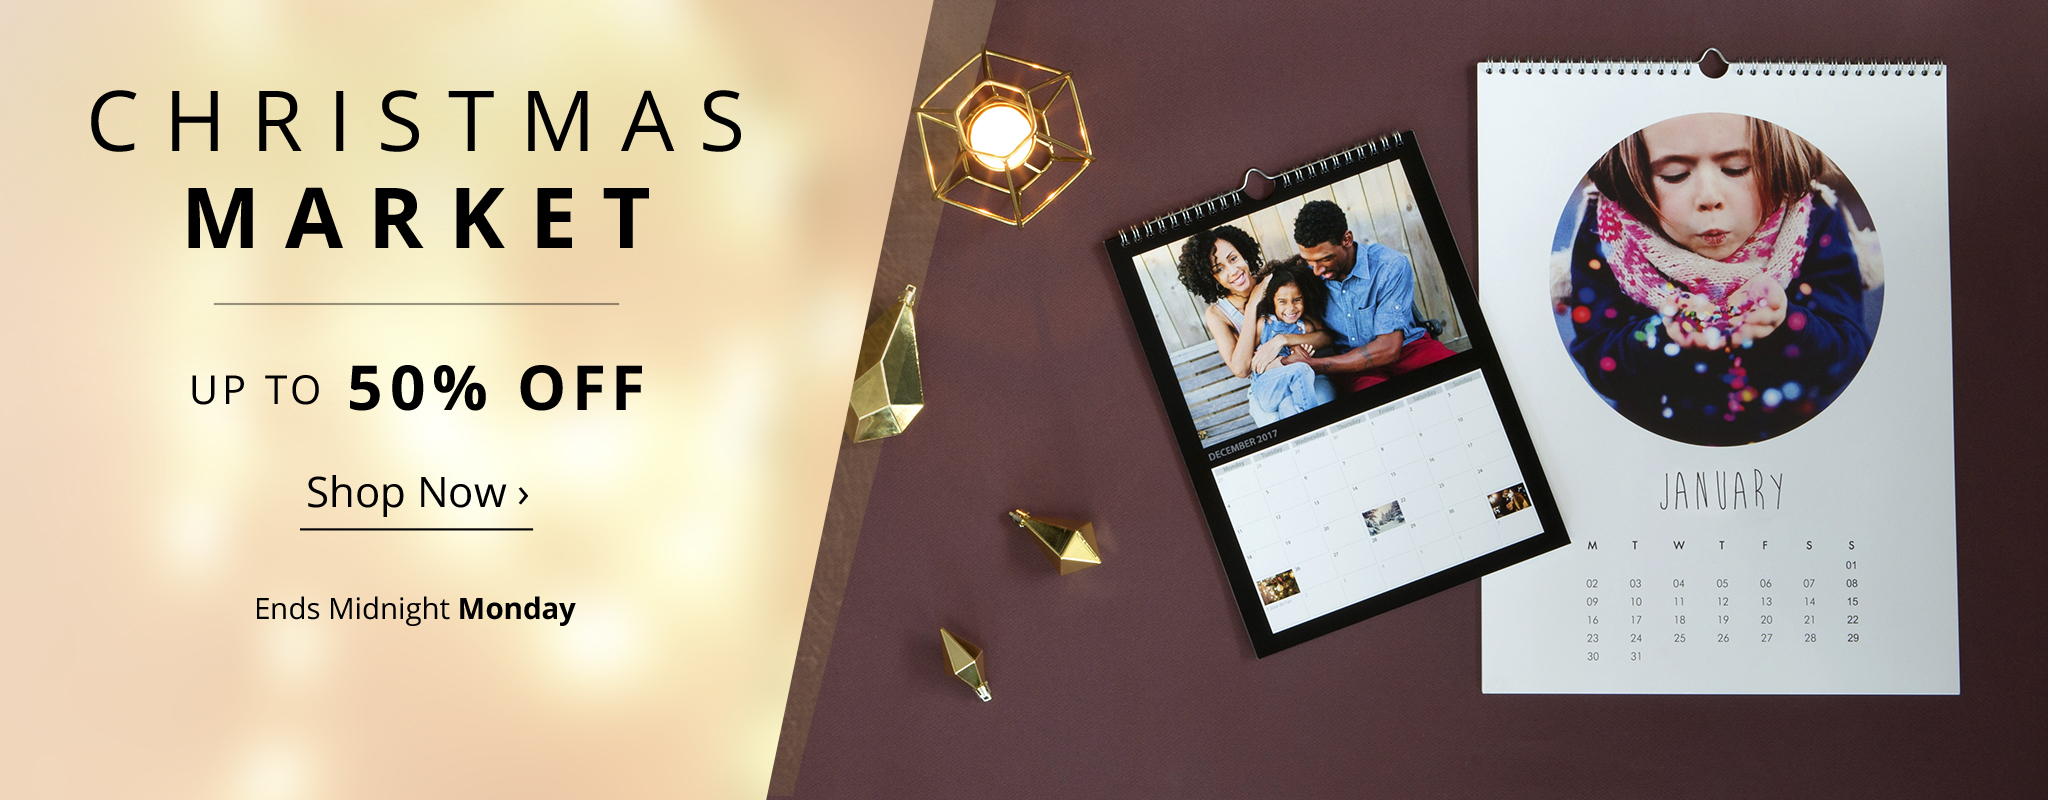 Christmas Market up to 50% off - desktop carousel 1